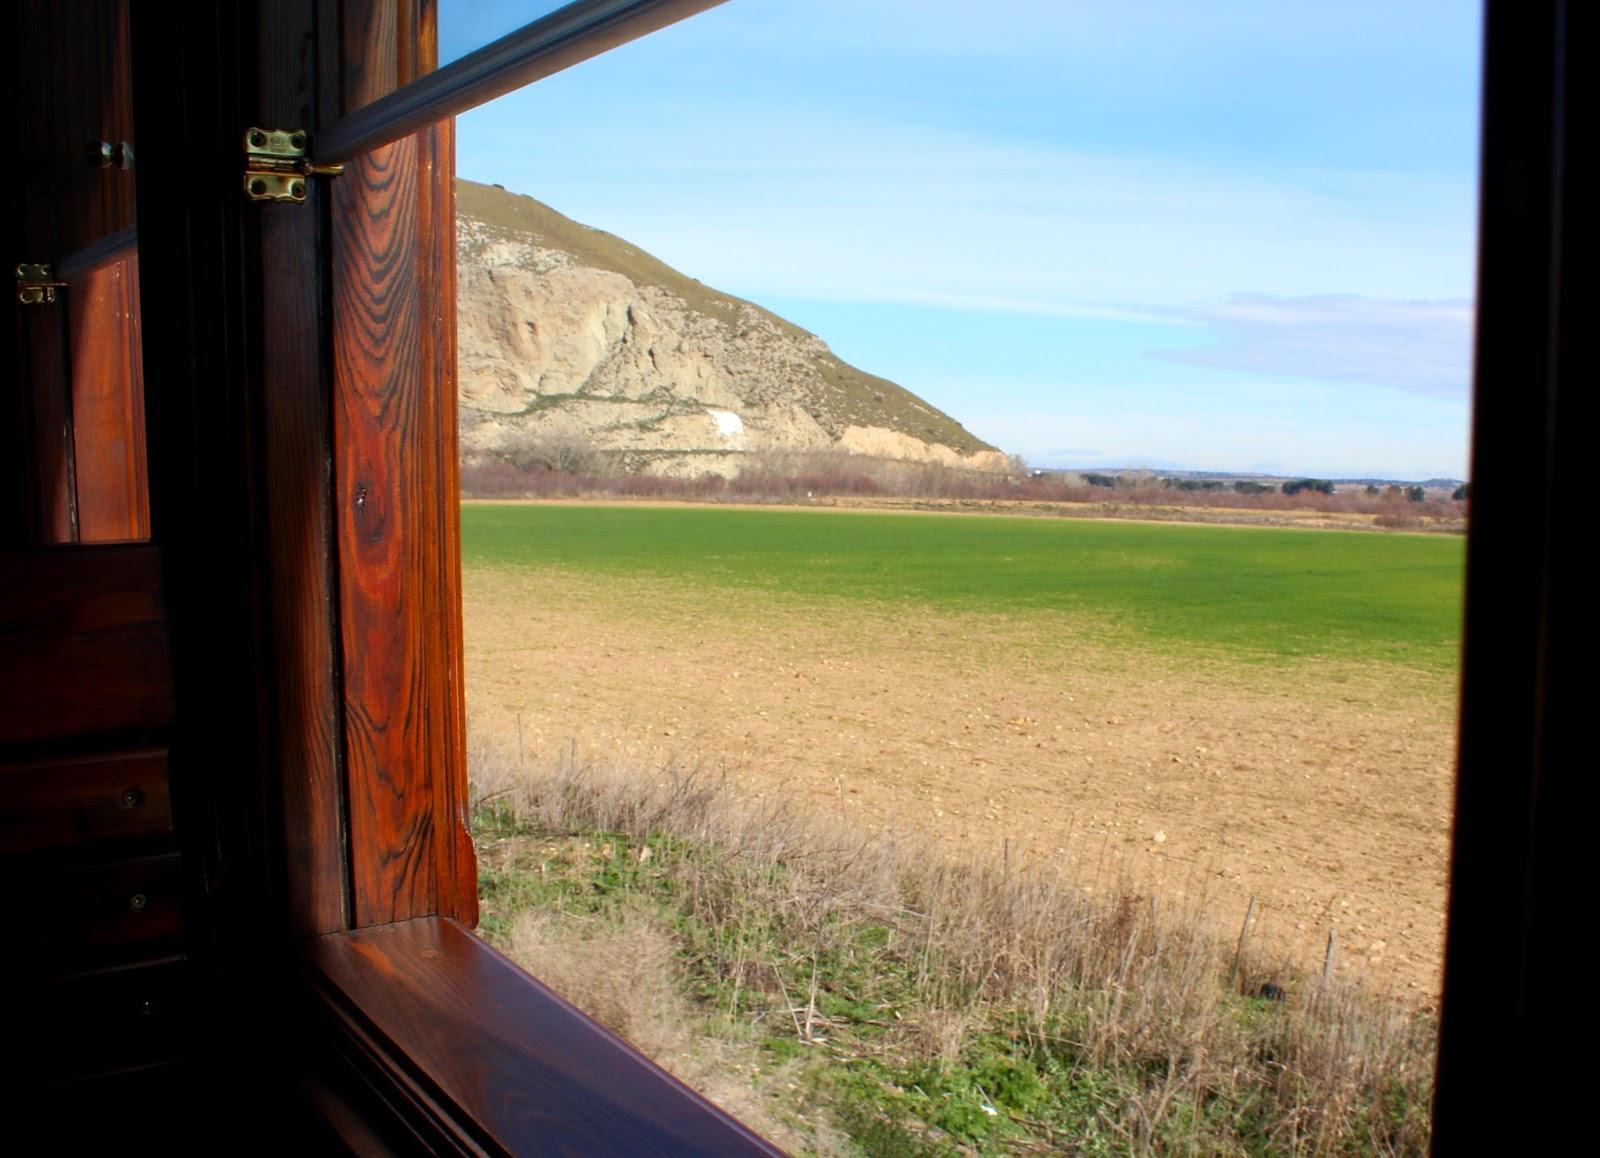 Vega del Tajuña desde el tren de vapor, tren de Arganda